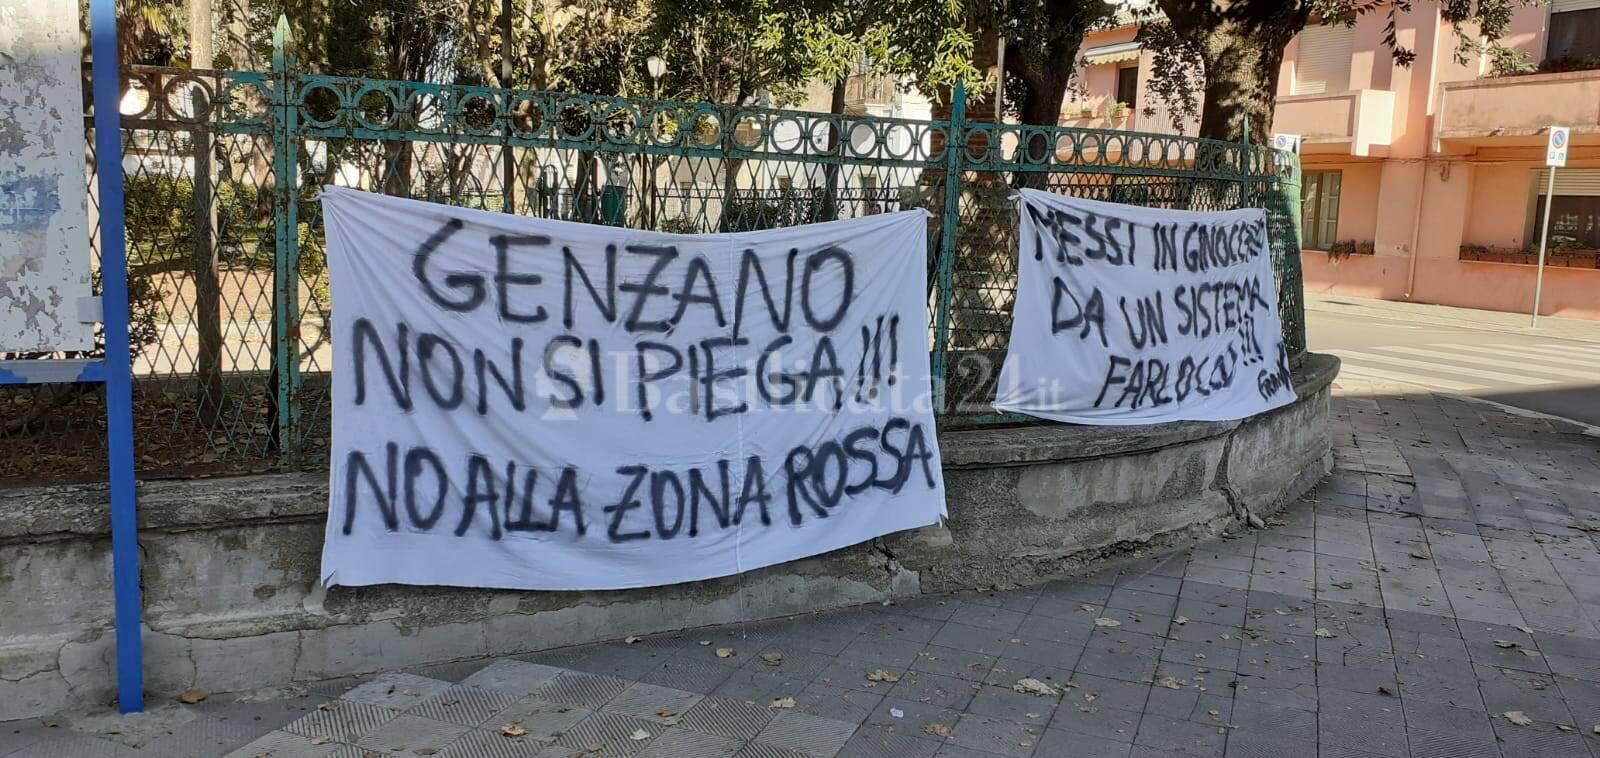 Genzano